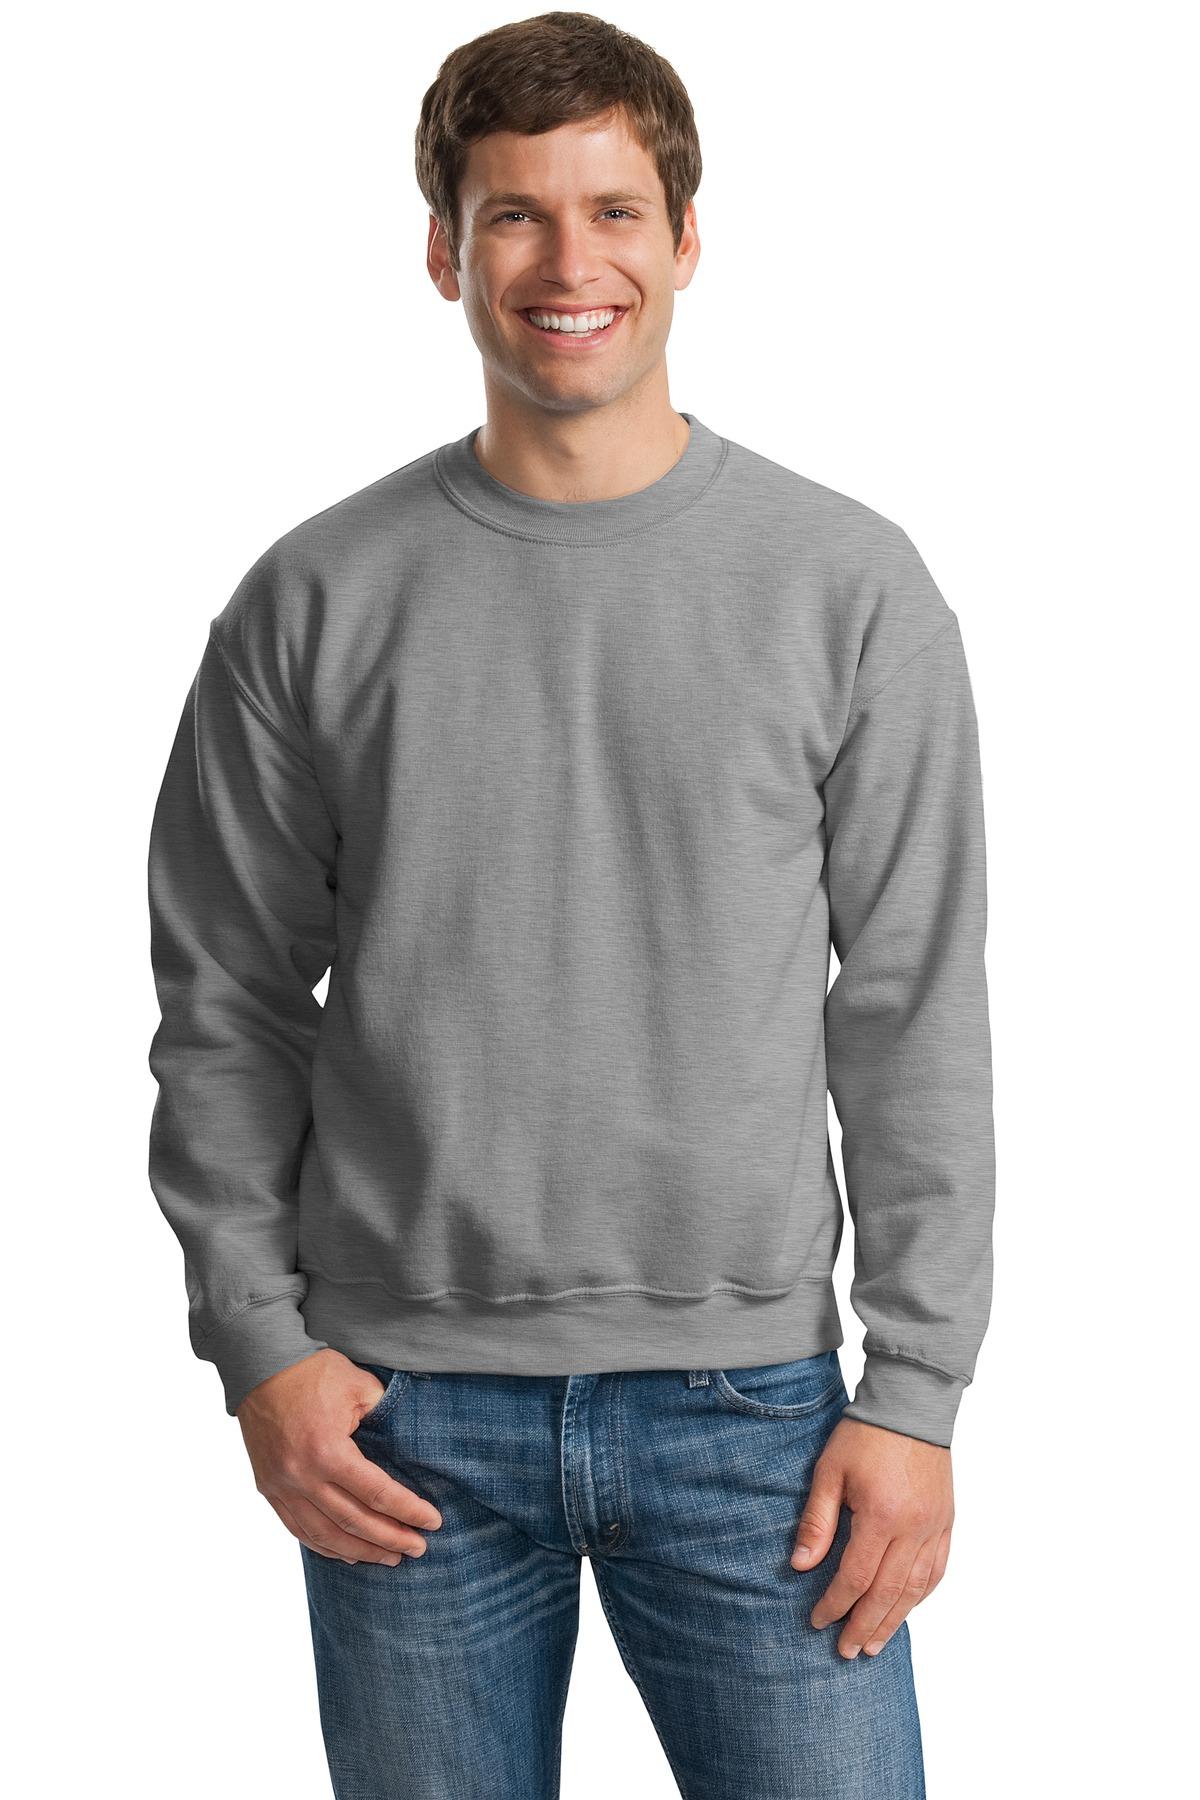 Gildan Heavy Blend Crewneck Sweatshirt. 18000.